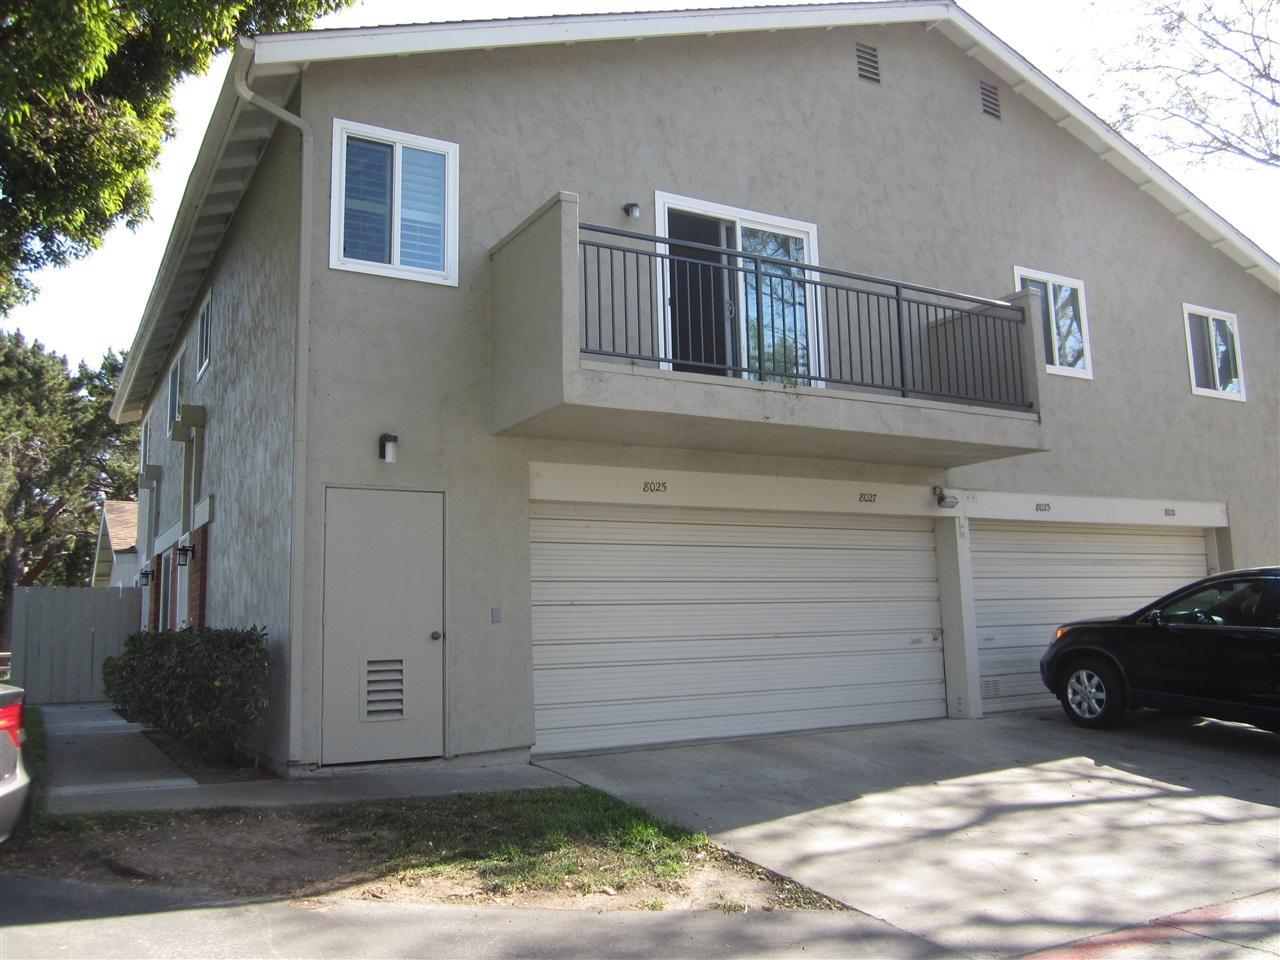 8025 Camino Kiosco, San Diego, CA 92122 (#170020012) :: Whissel Realty